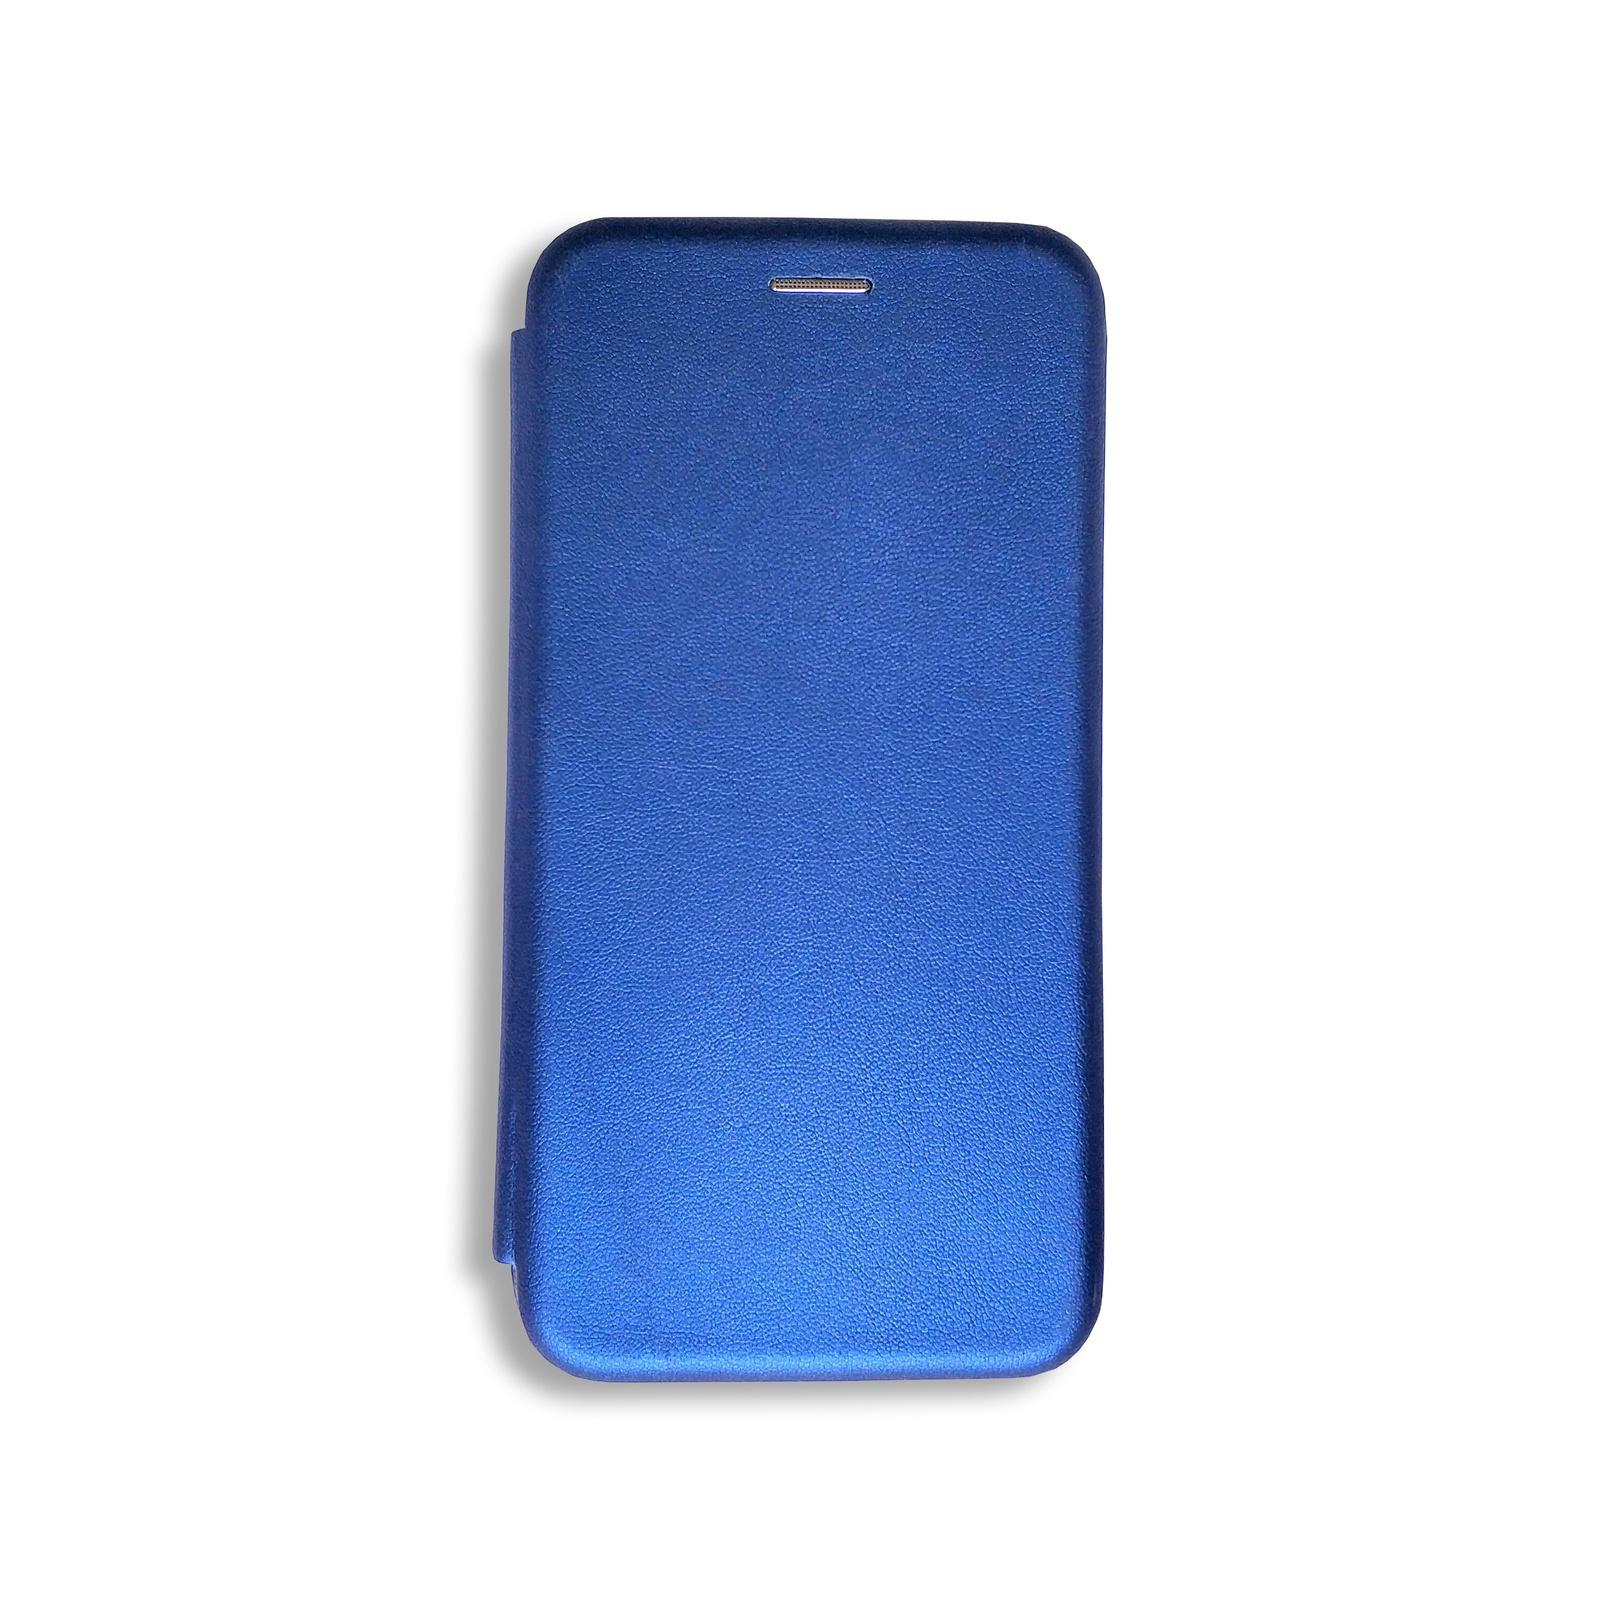 Чехол для сотового телефона книжка для Samsung Galaxy S10, синий